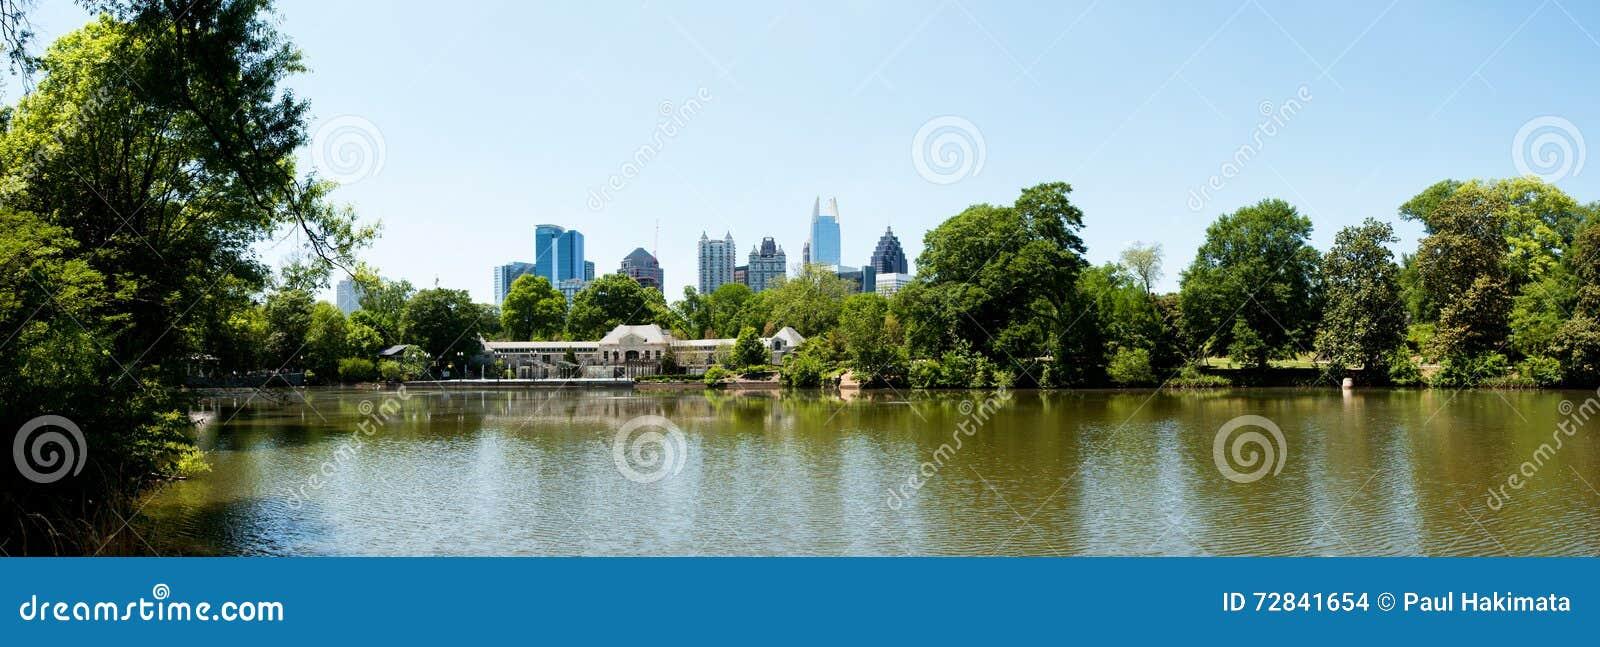 Lake Clara Meer In Piedmont Park Atlanta Stock Photo - Image